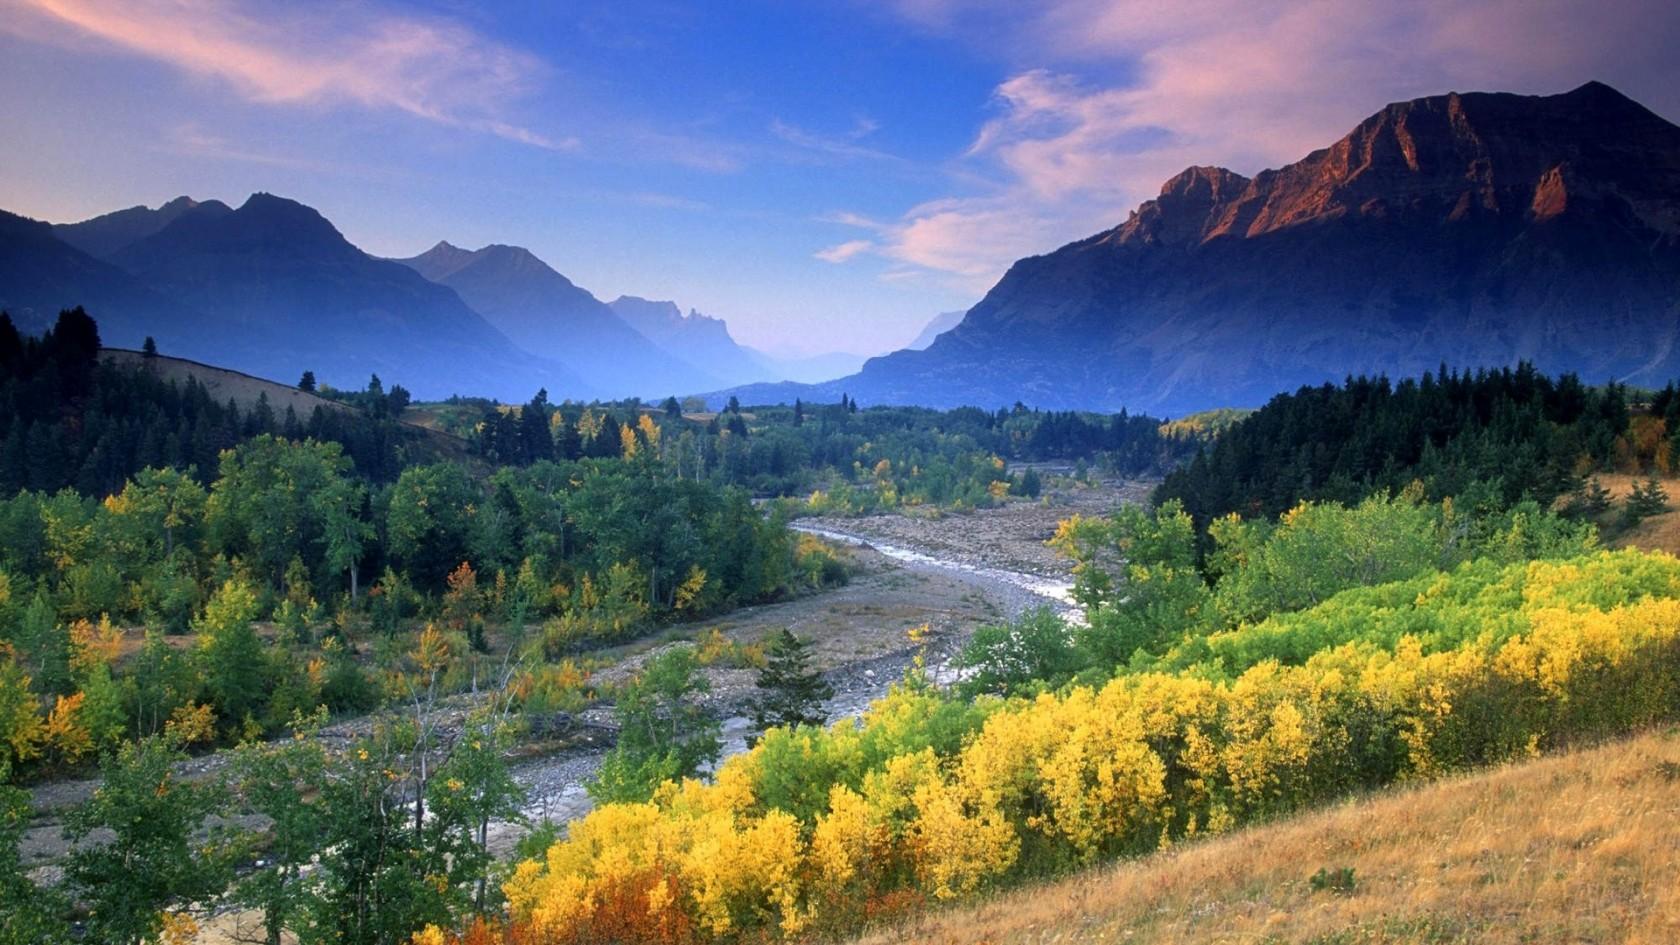 Mountain Landscape Nature Photography